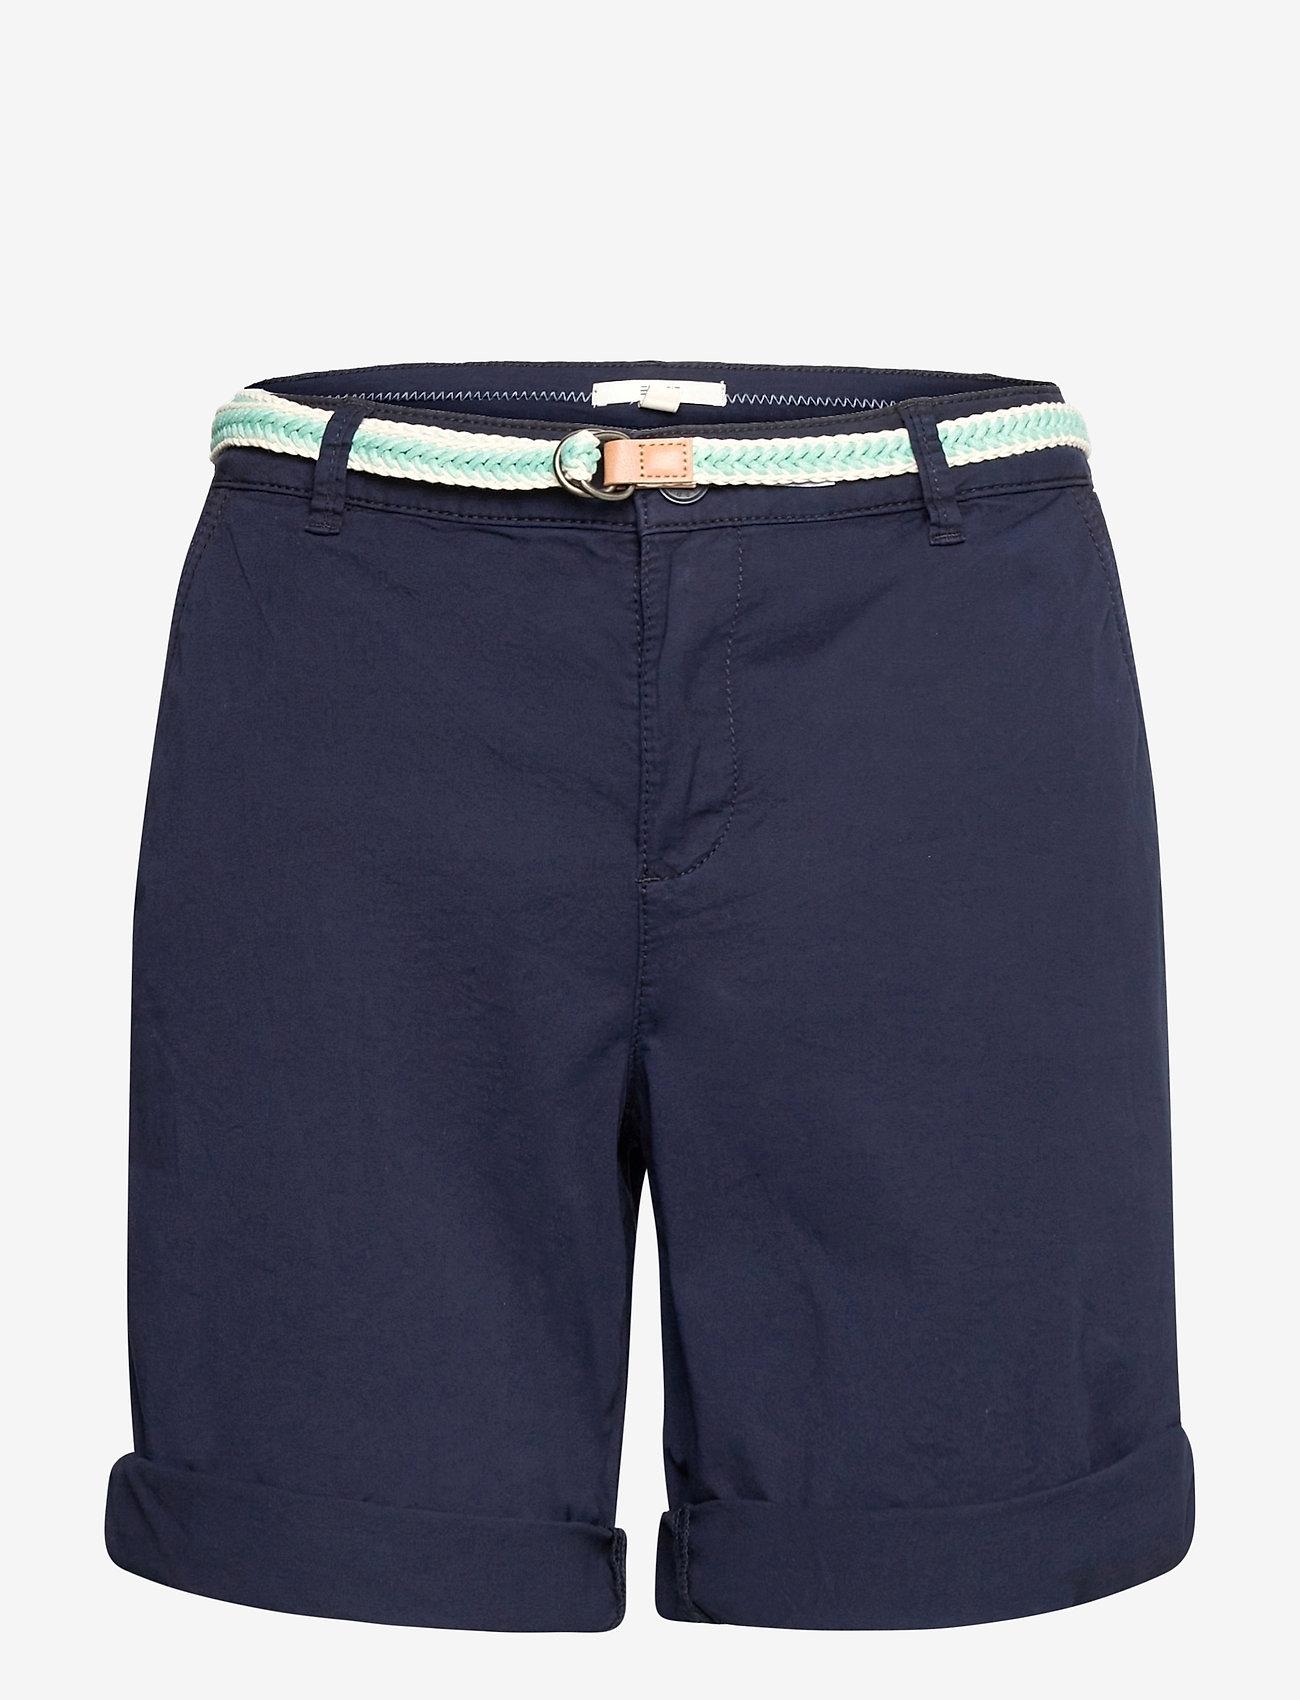 Esprit Casual - Shorts woven - chino shorts - navy - 0